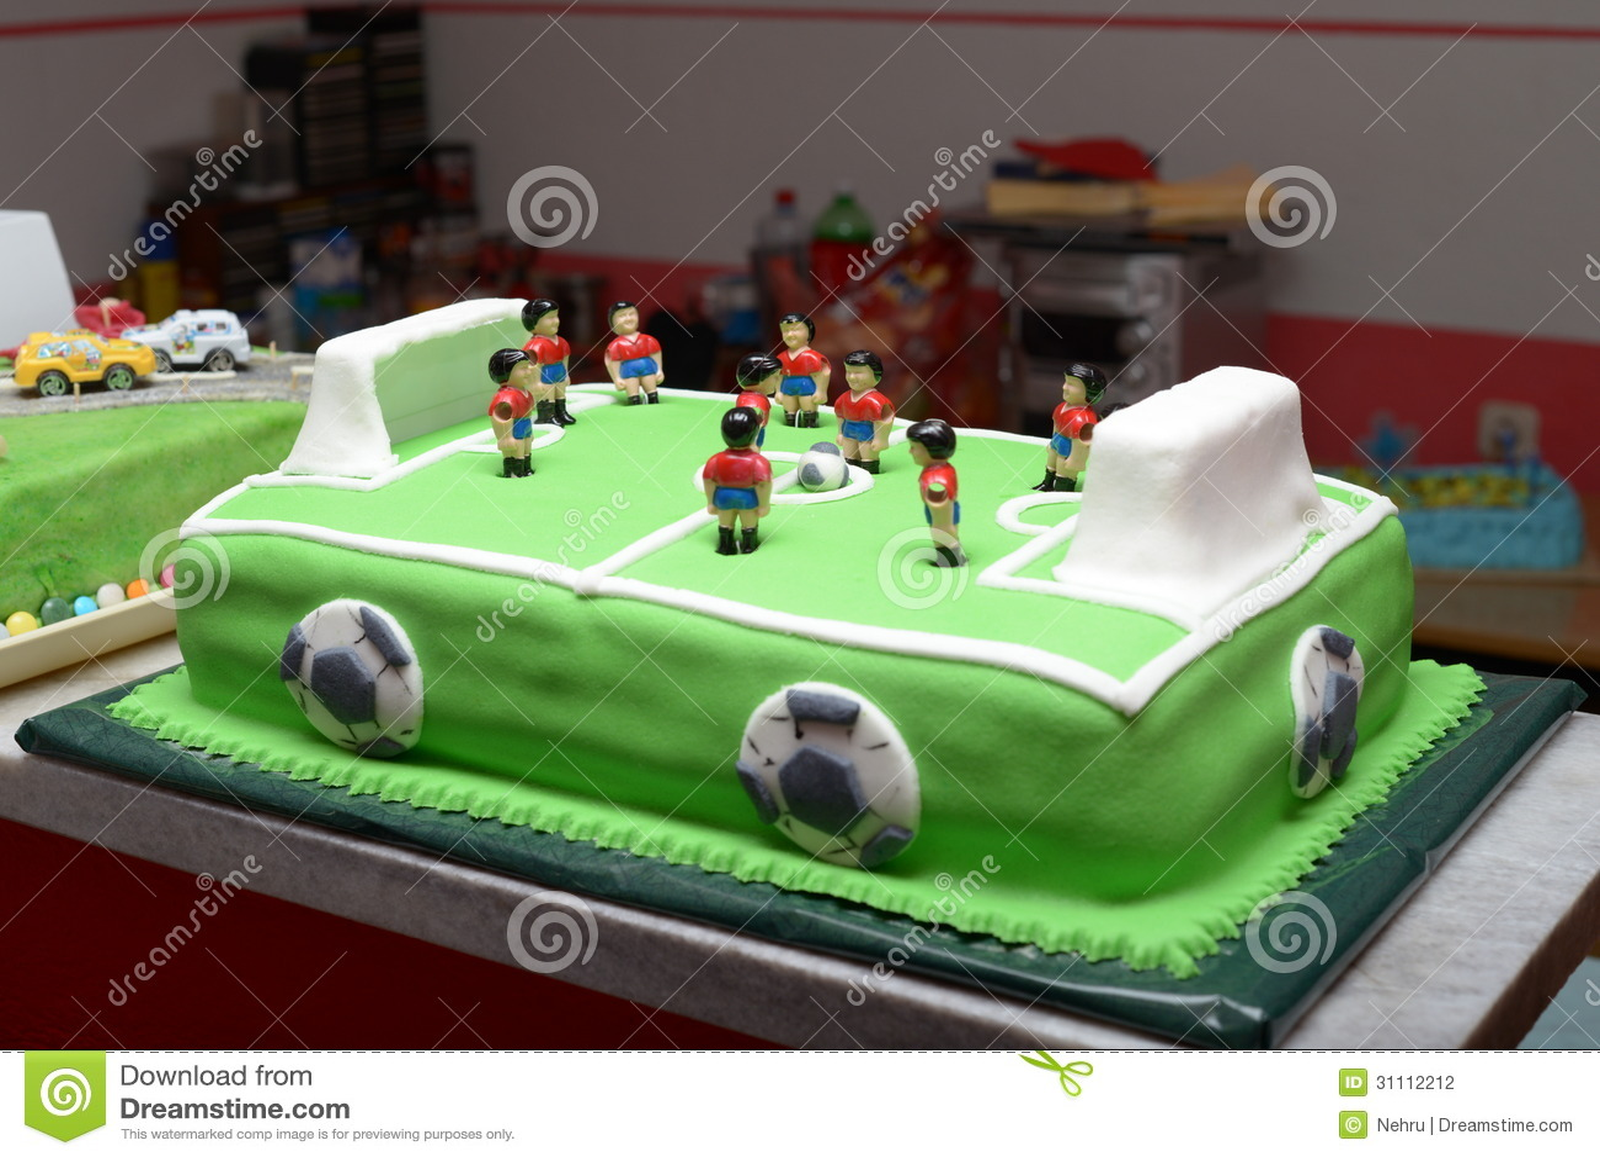 Cake Boss Pokemon Cake